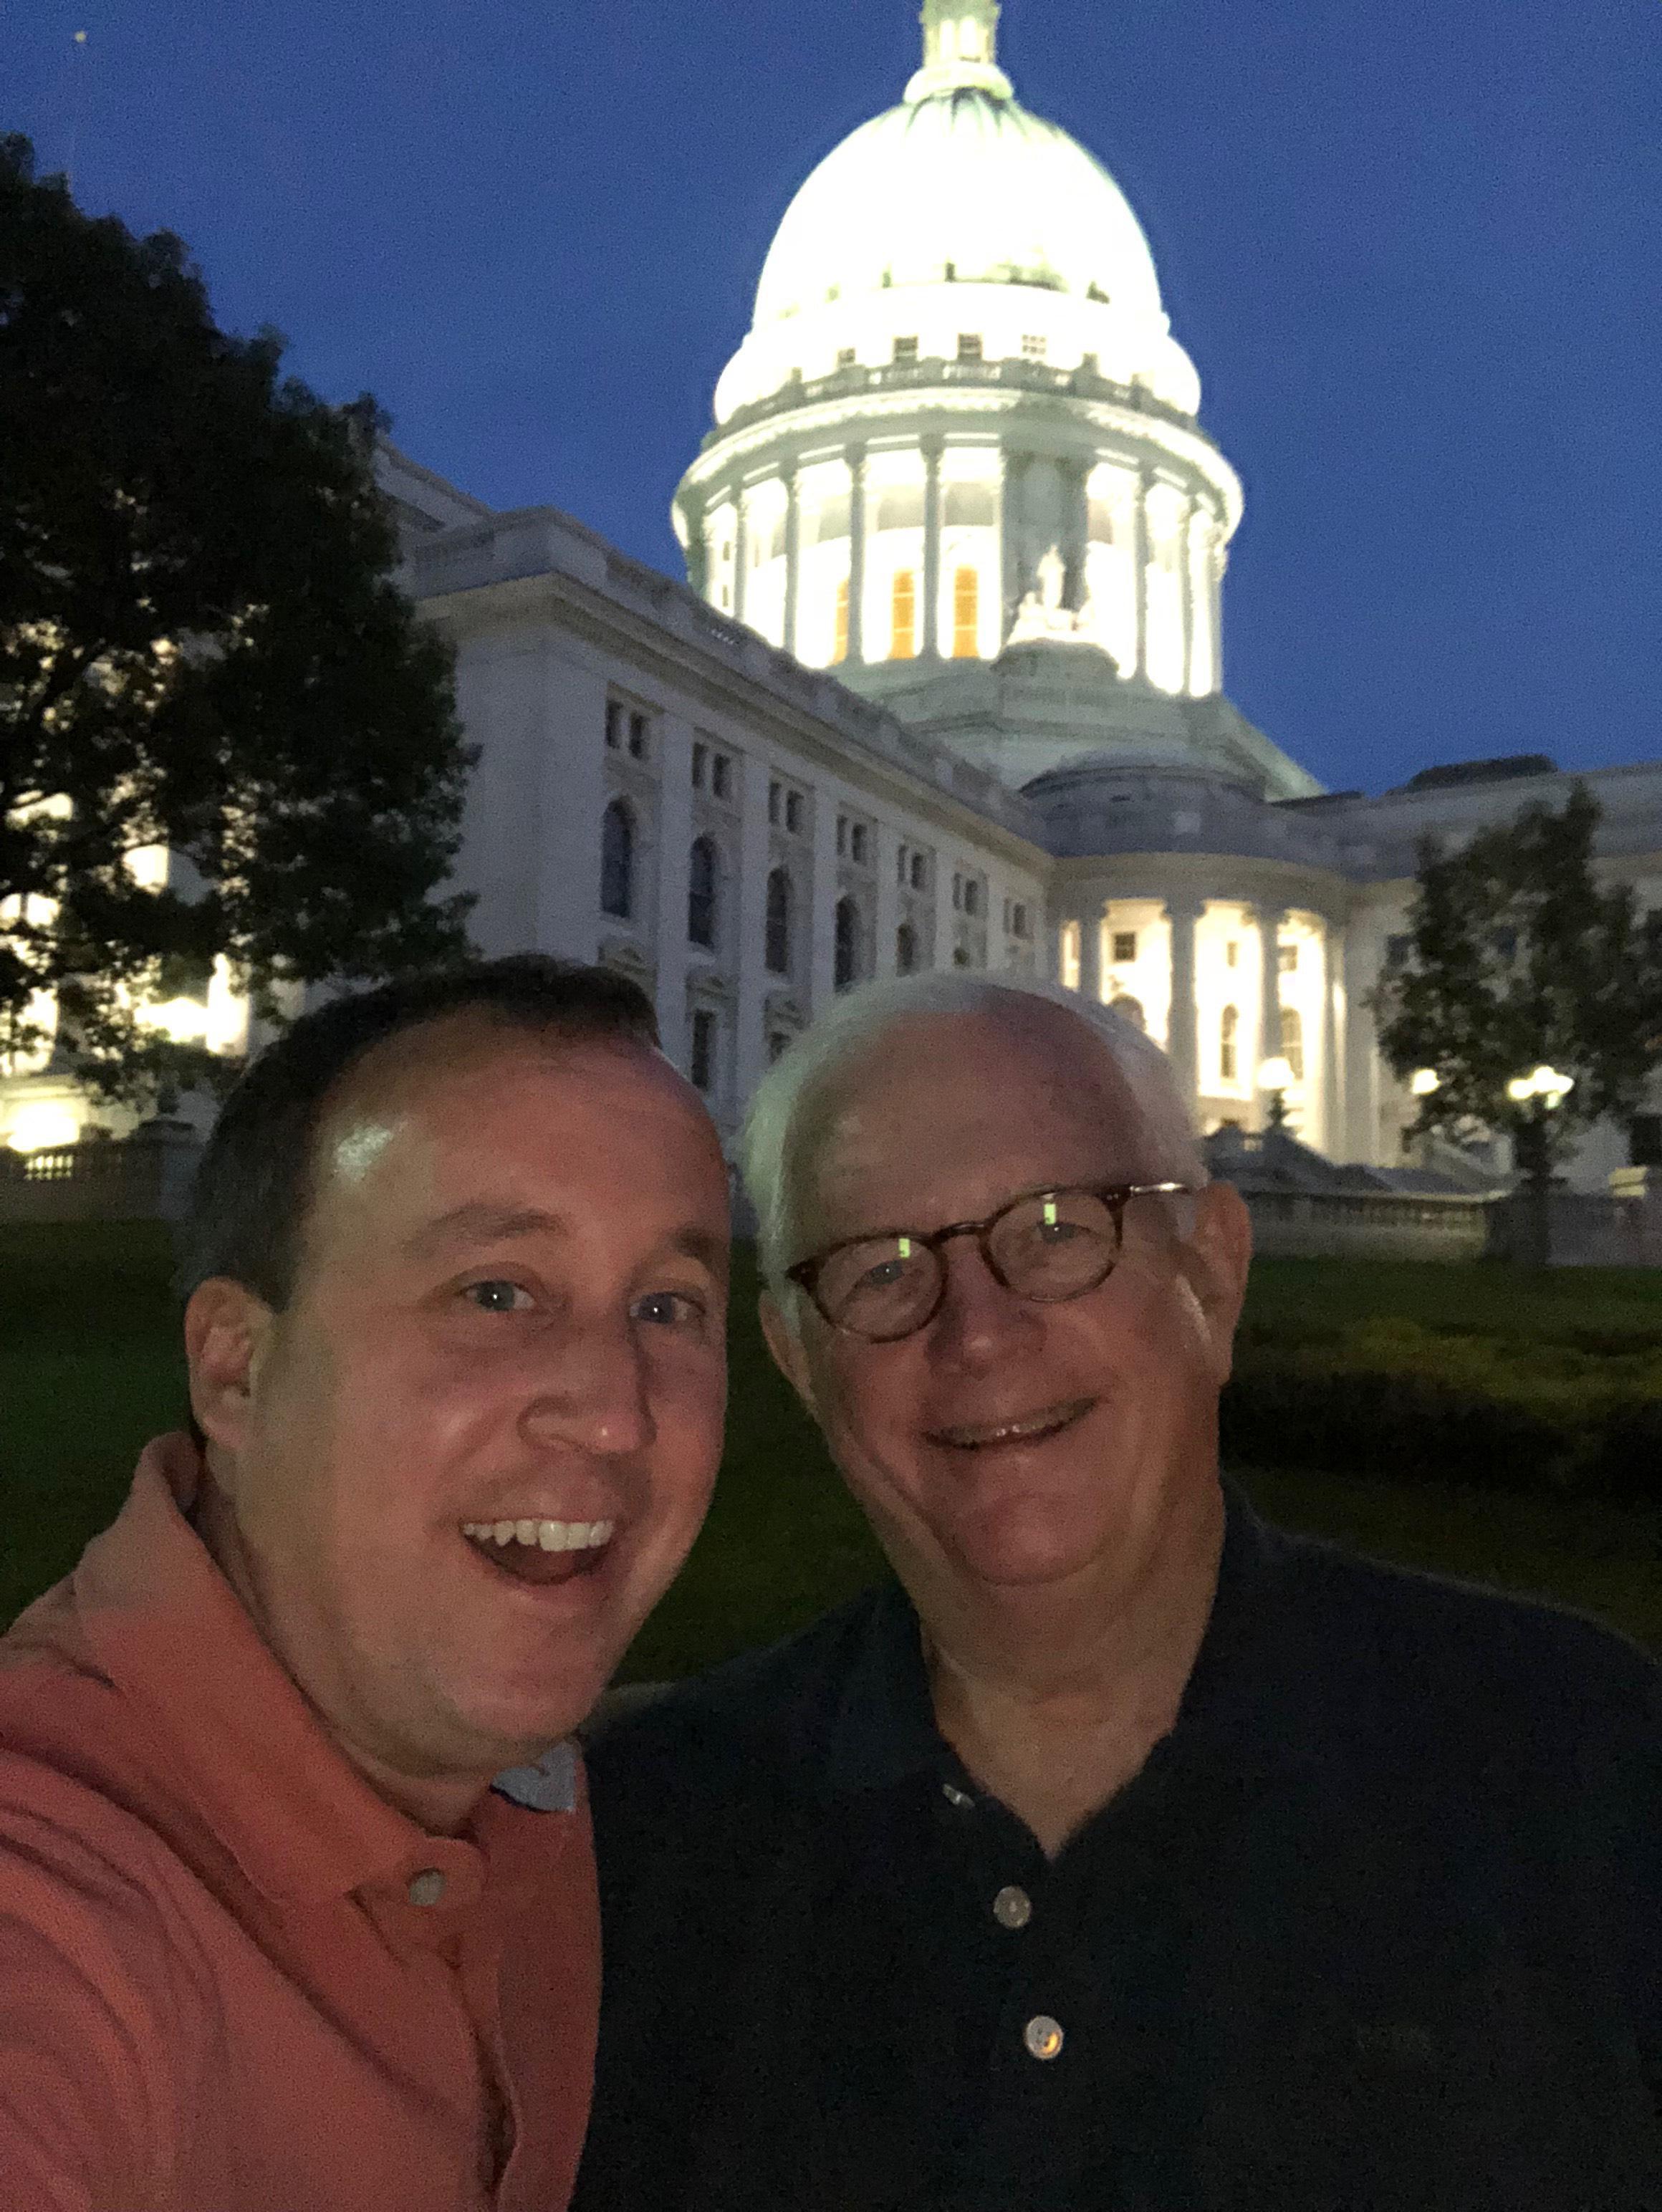 Brad and Gene road trip